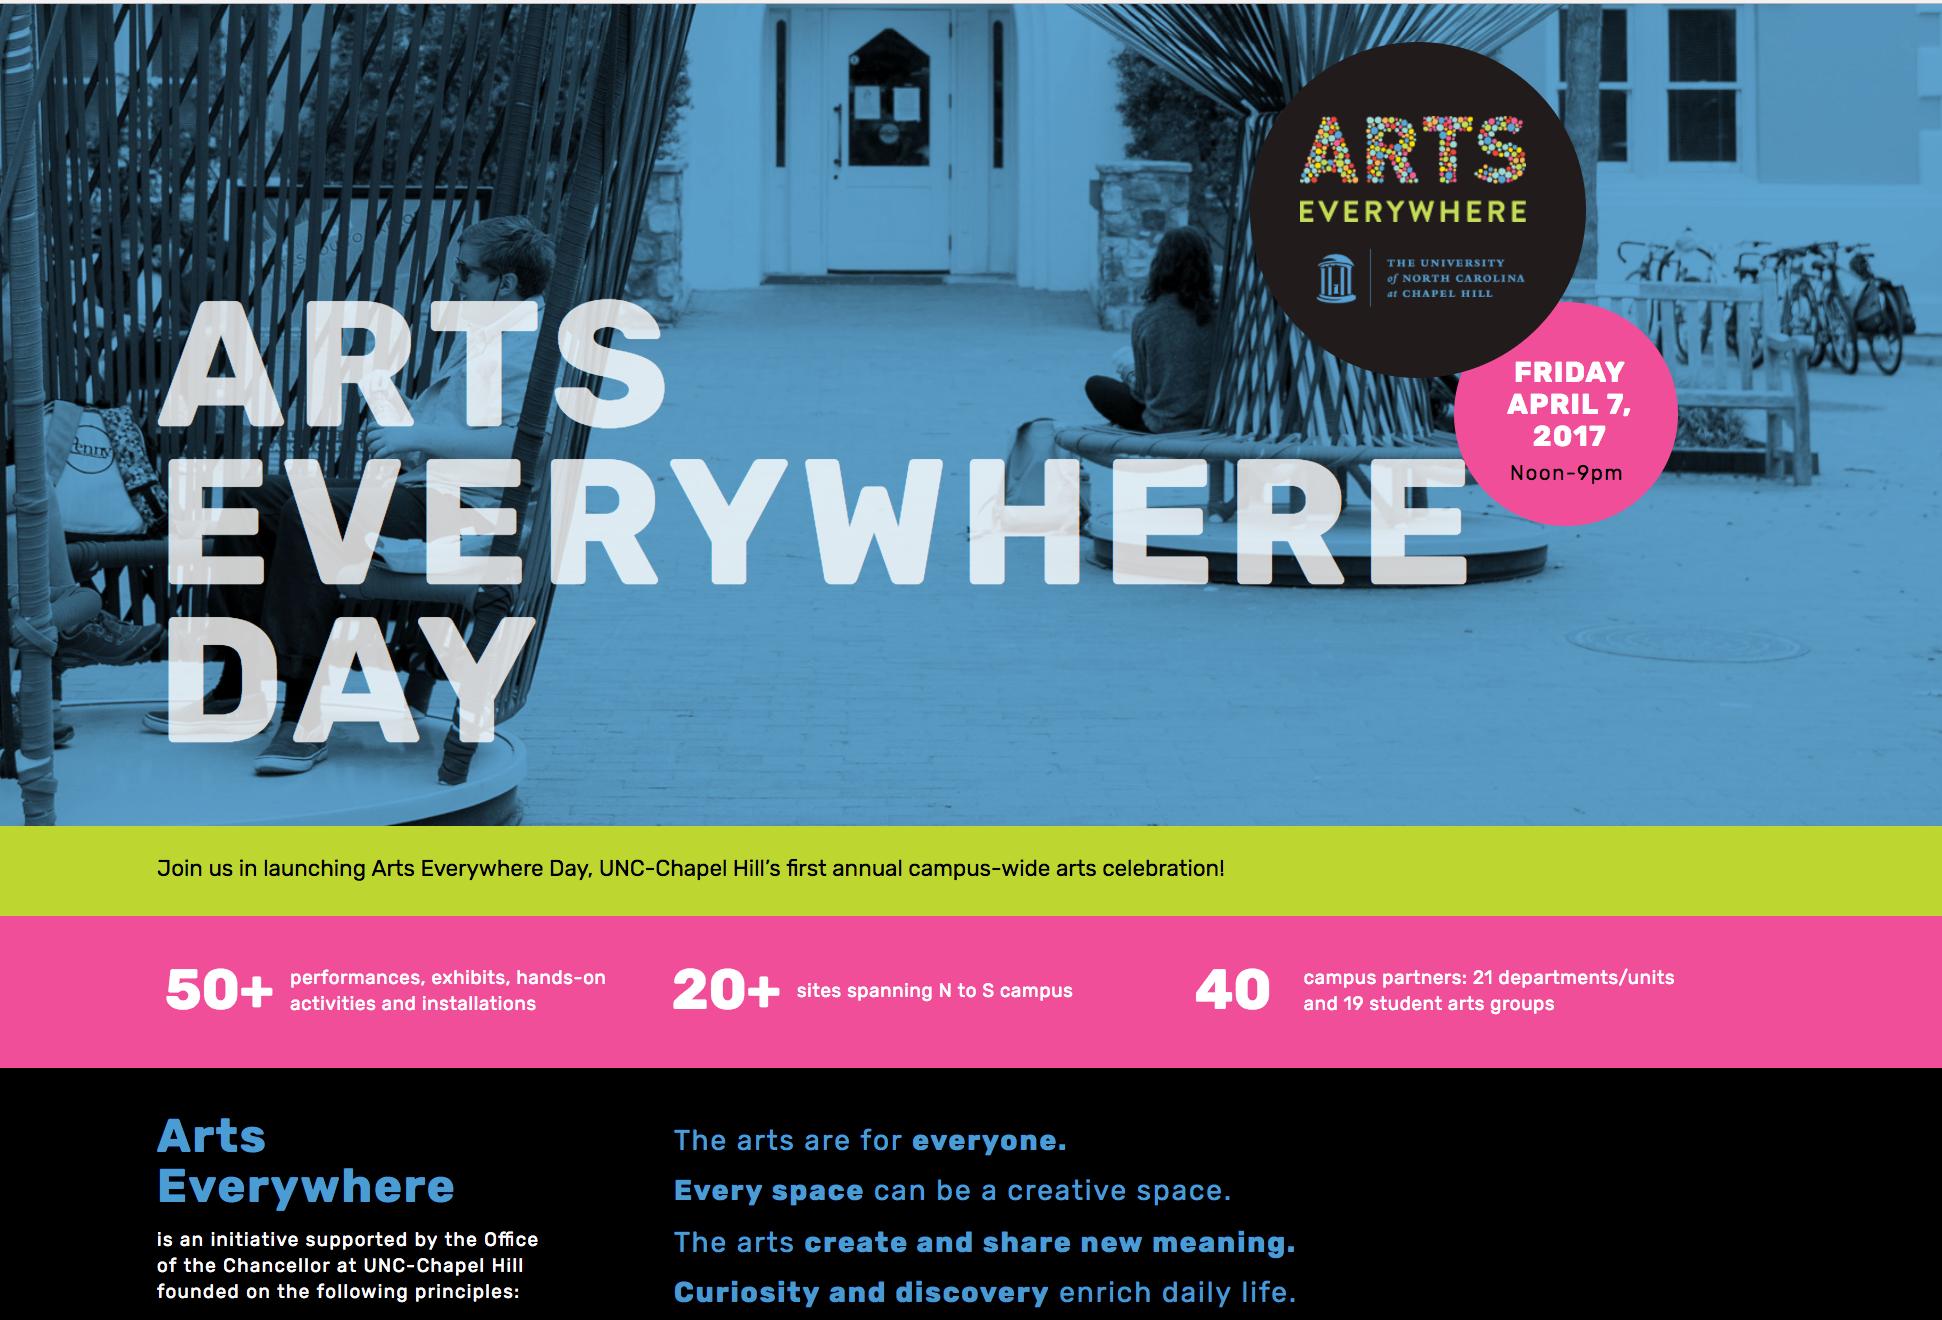 Portfolio: Arts Everywhere